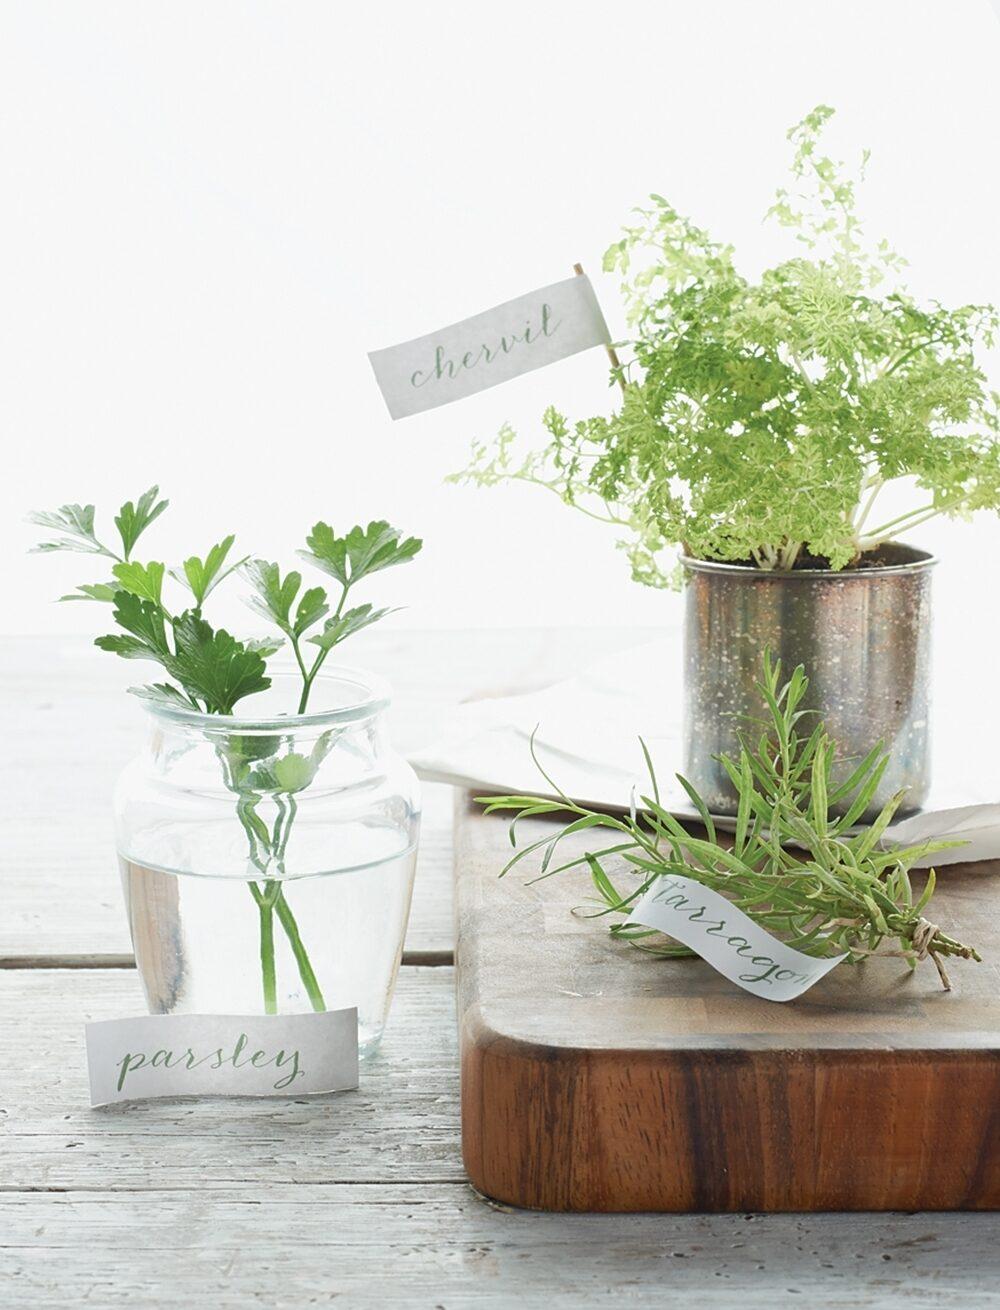 Parsley, tarragon and chervil herbs